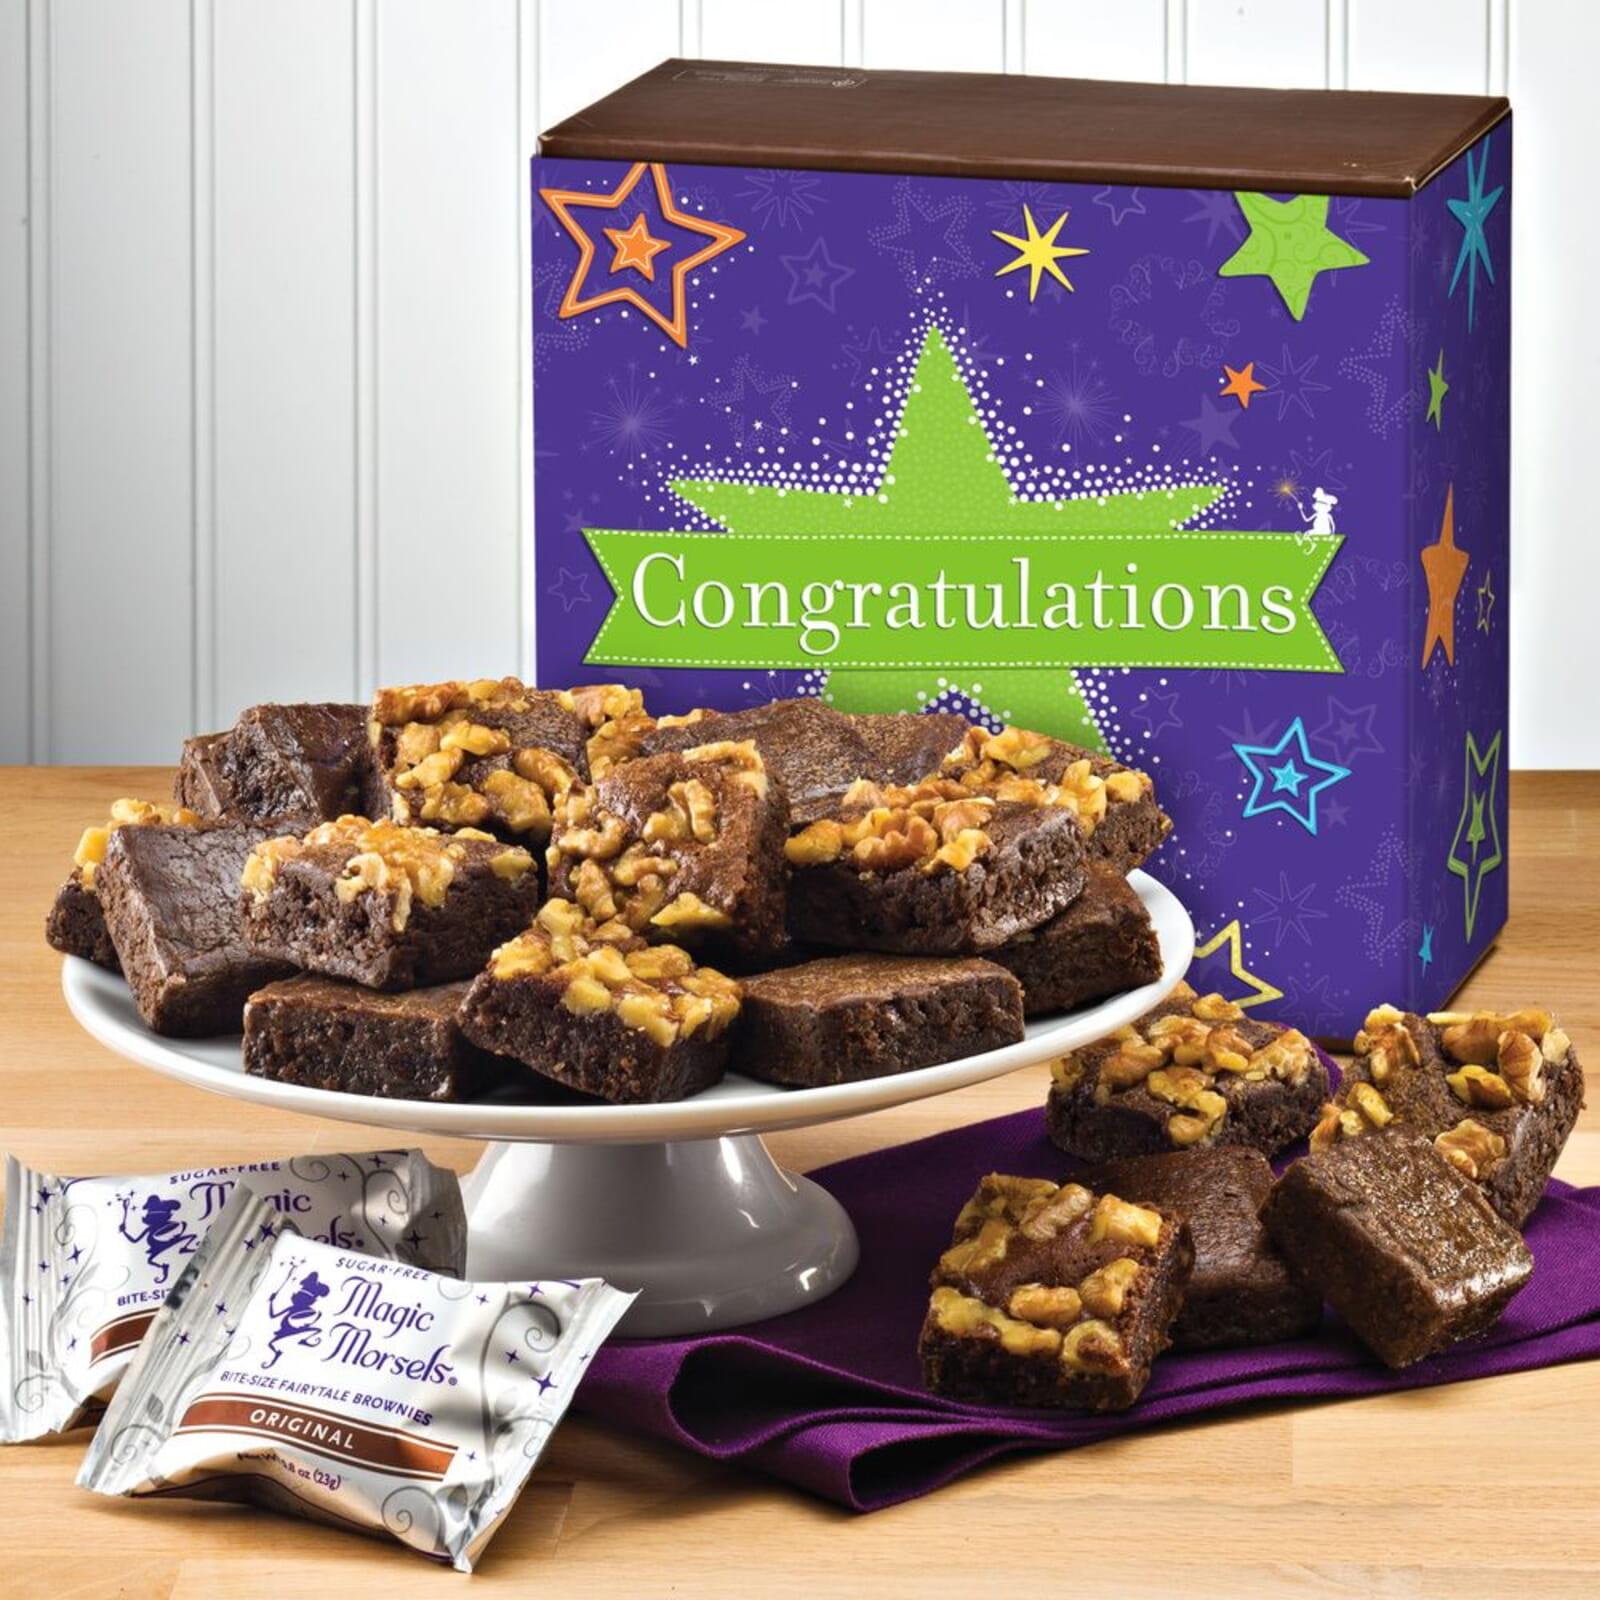 Congratulations Sugar-Free Morsel 36